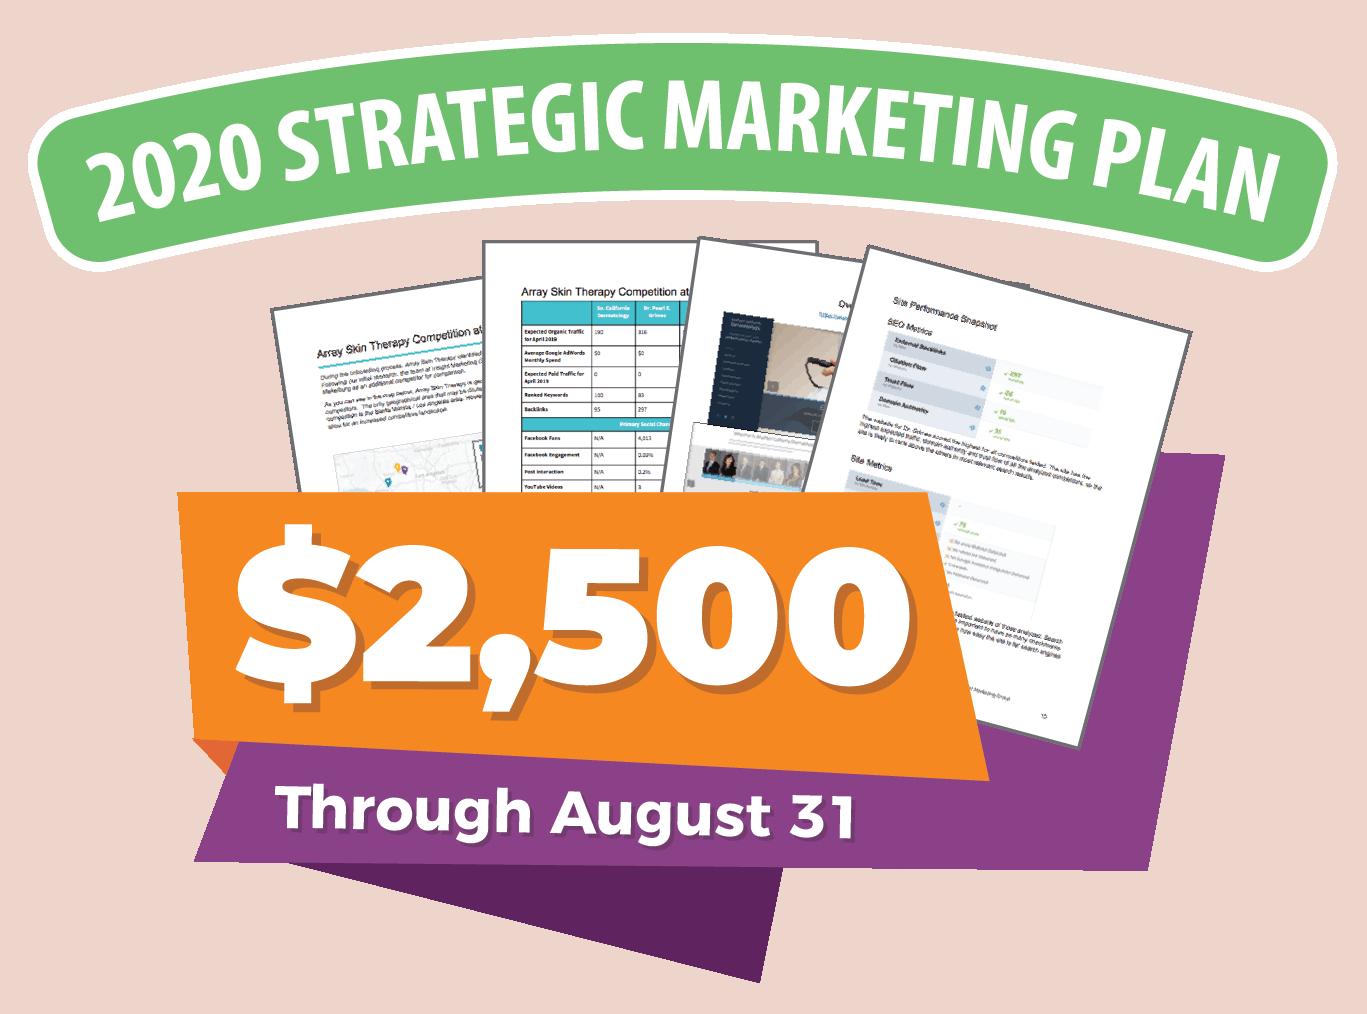 2020 Strategic Marketing Plan